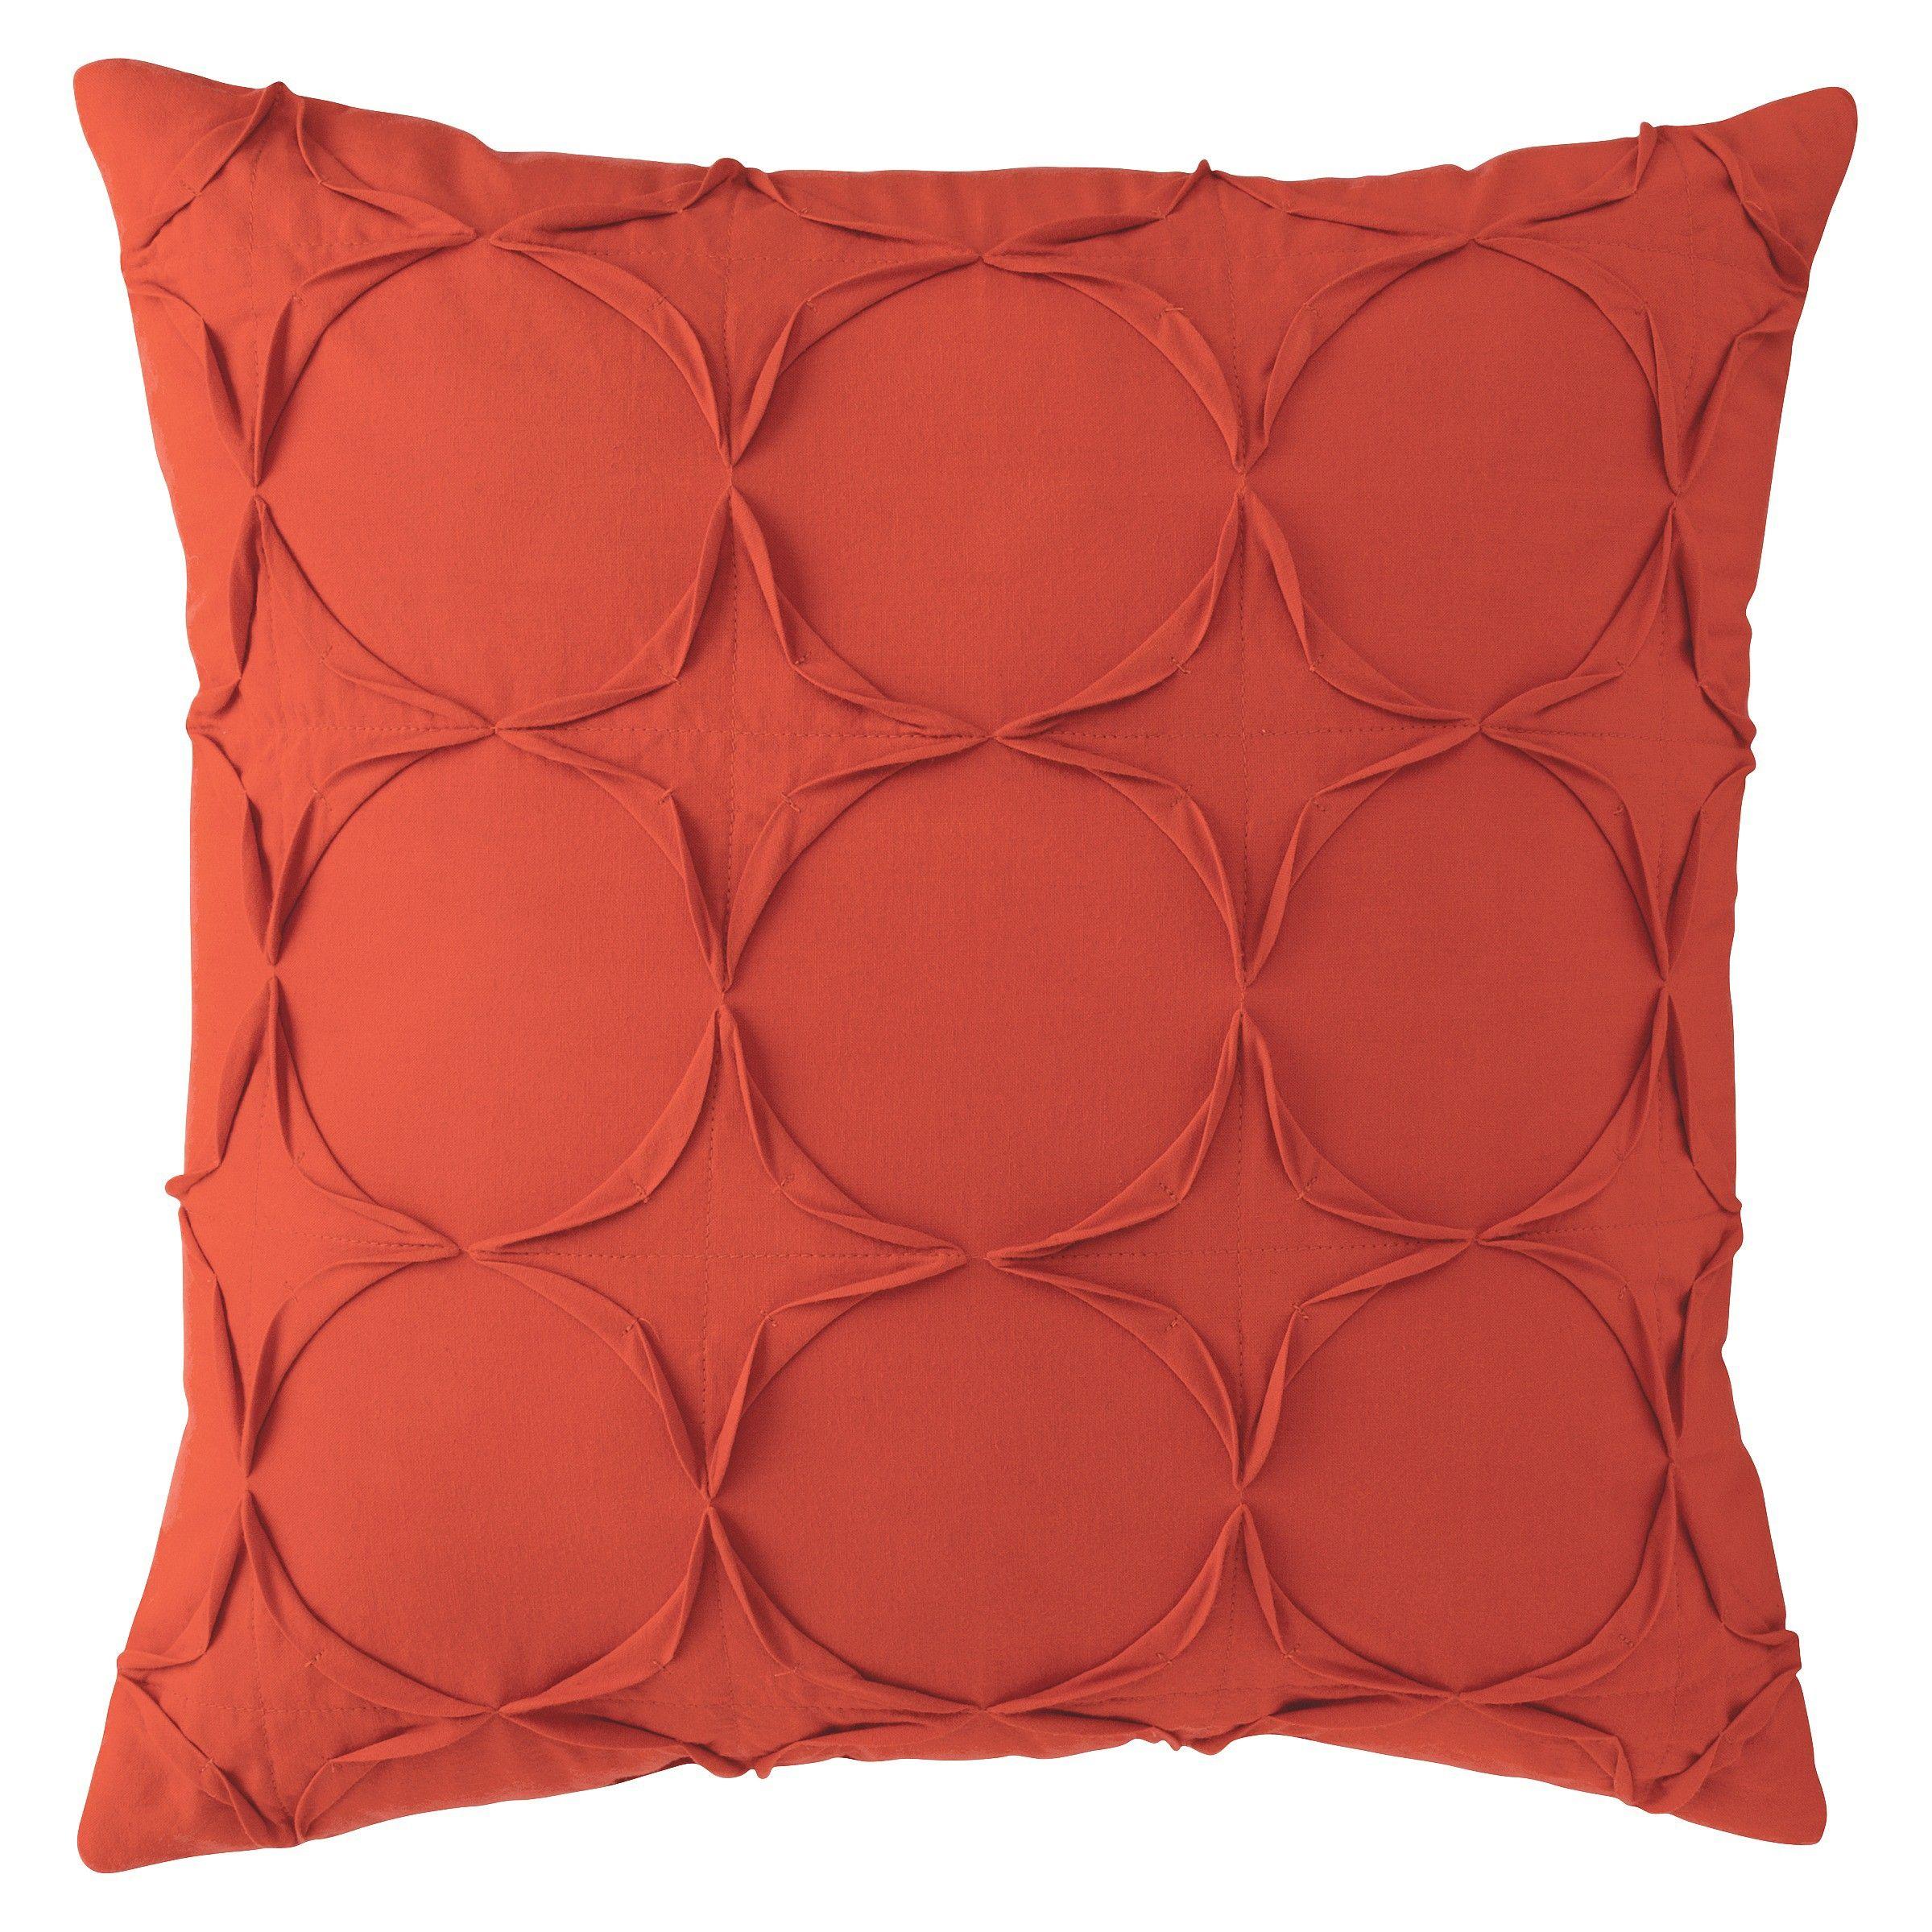 Room essentials circle texture decorative pillo